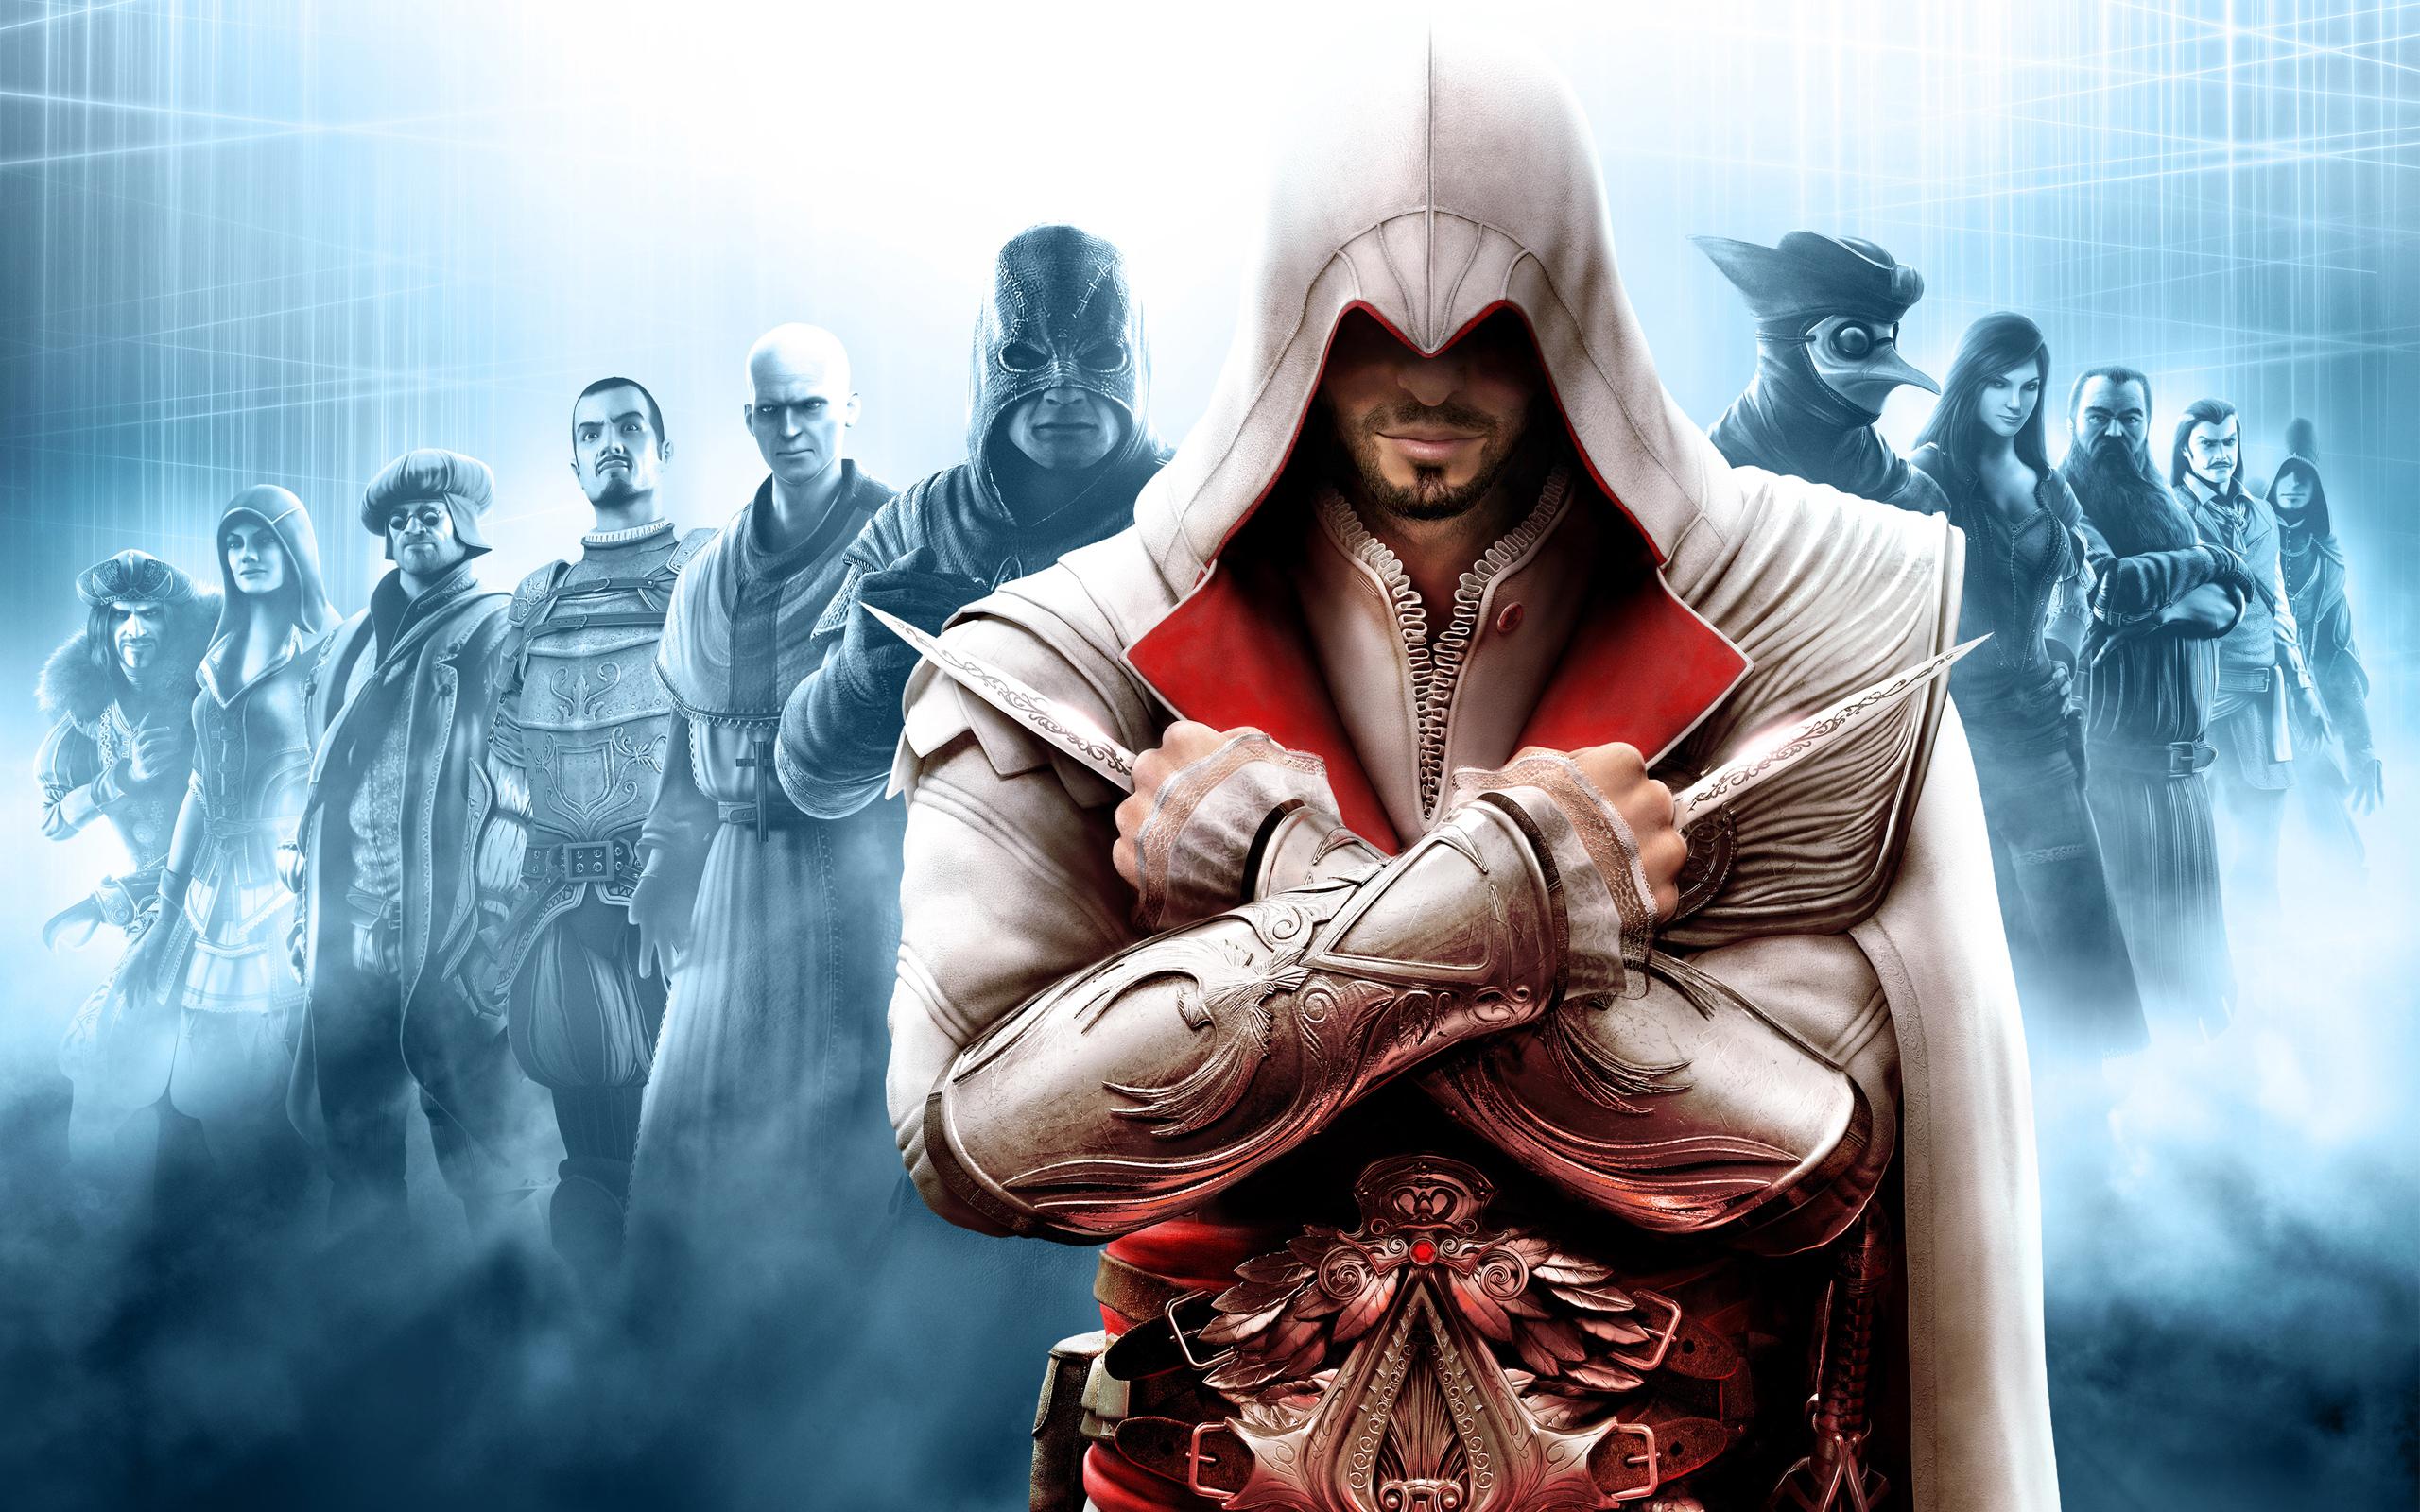 Assassins Creed Brotherhood Wallpapers HD Wallpapers 2560x1600